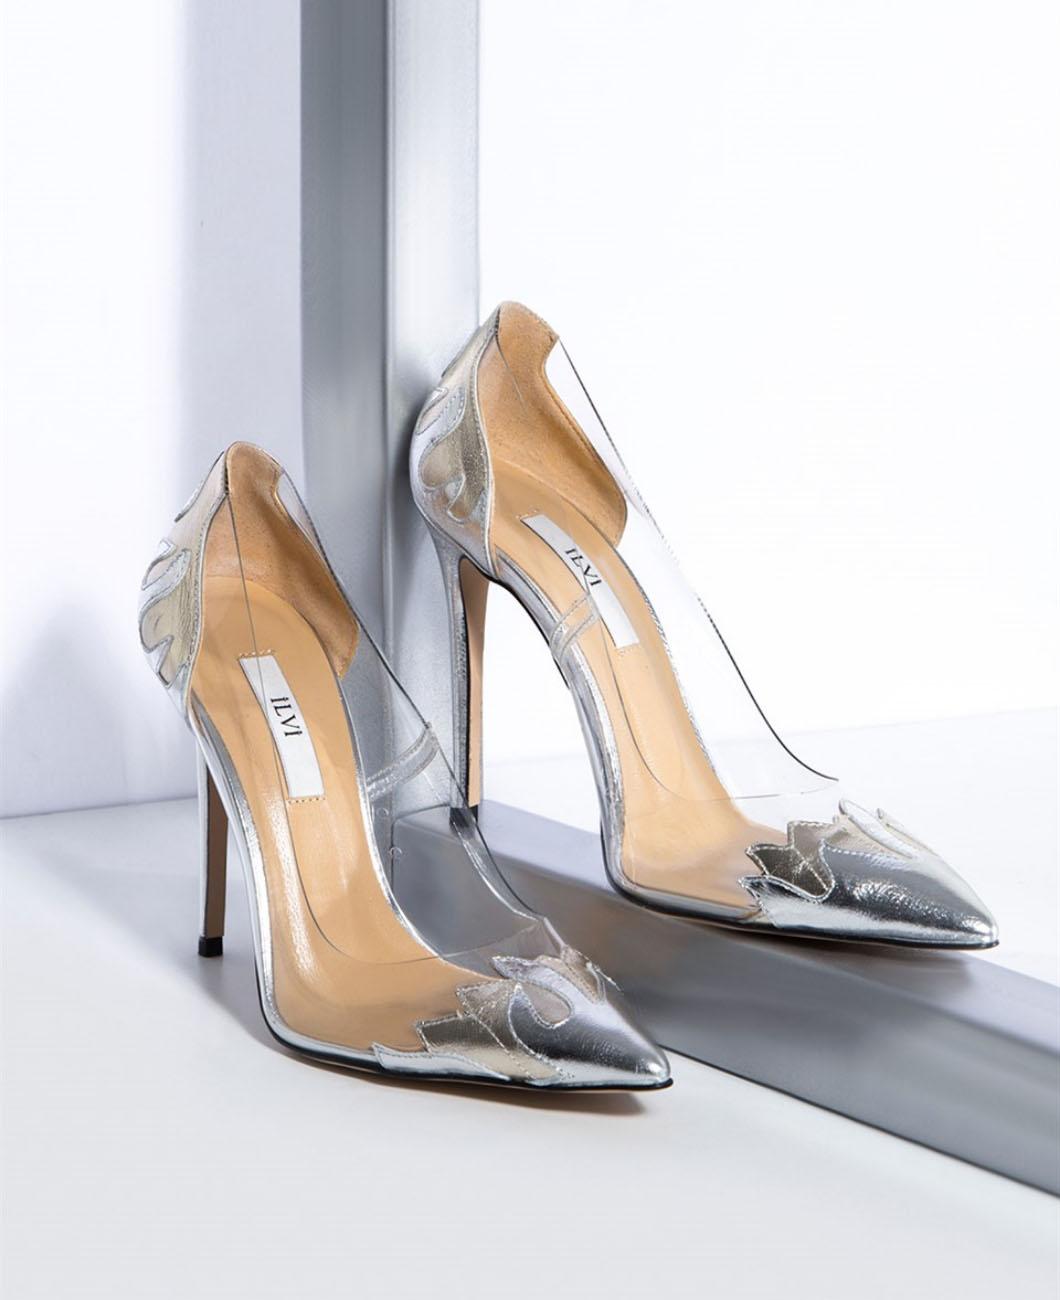 heels-stilettoes-generic-sky-news-ku-too-la-polo-lapolo